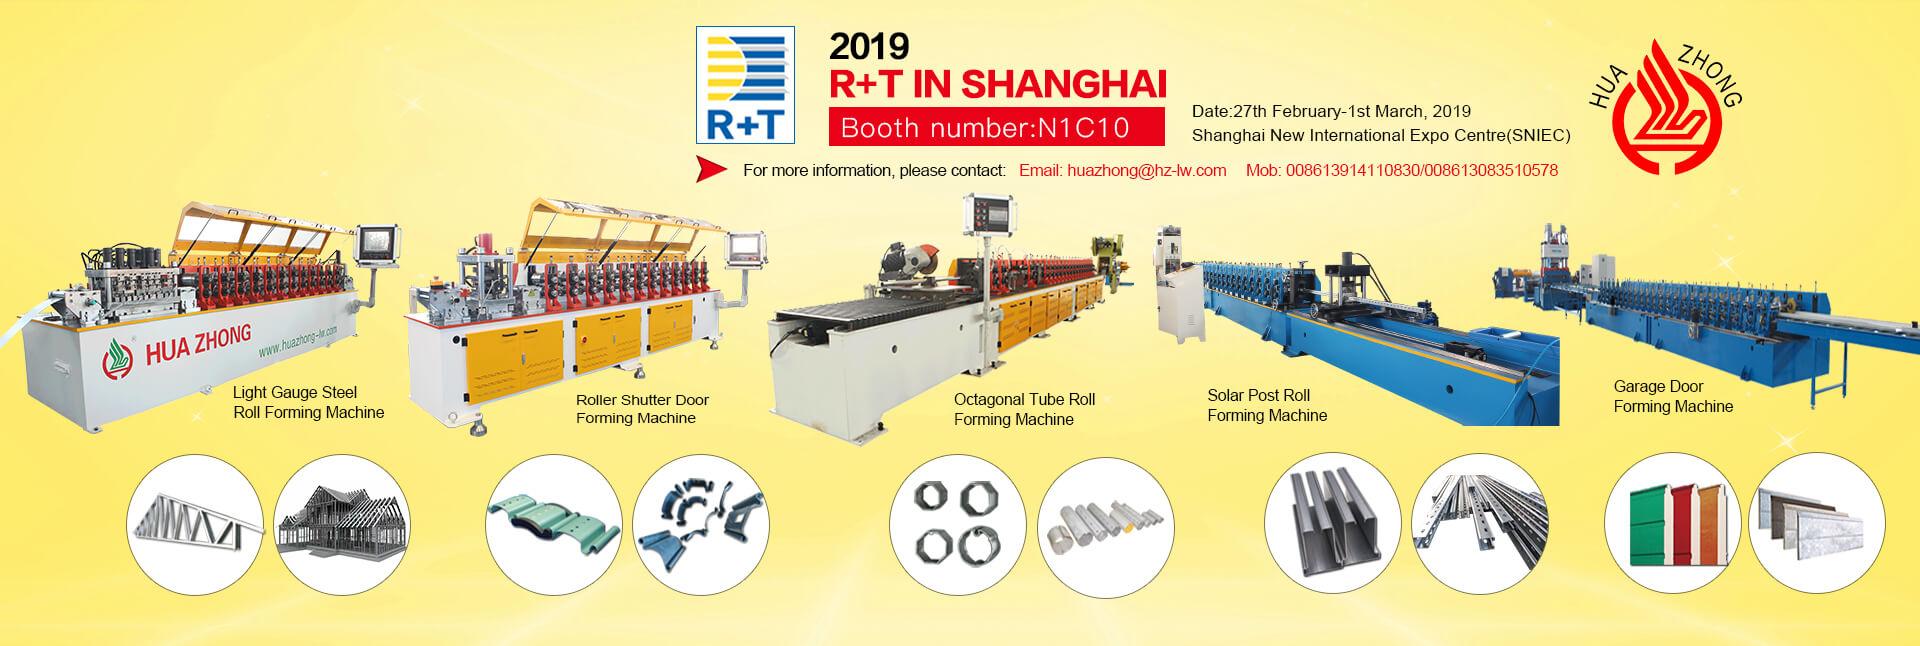 2019 SHANGHAI R+T111